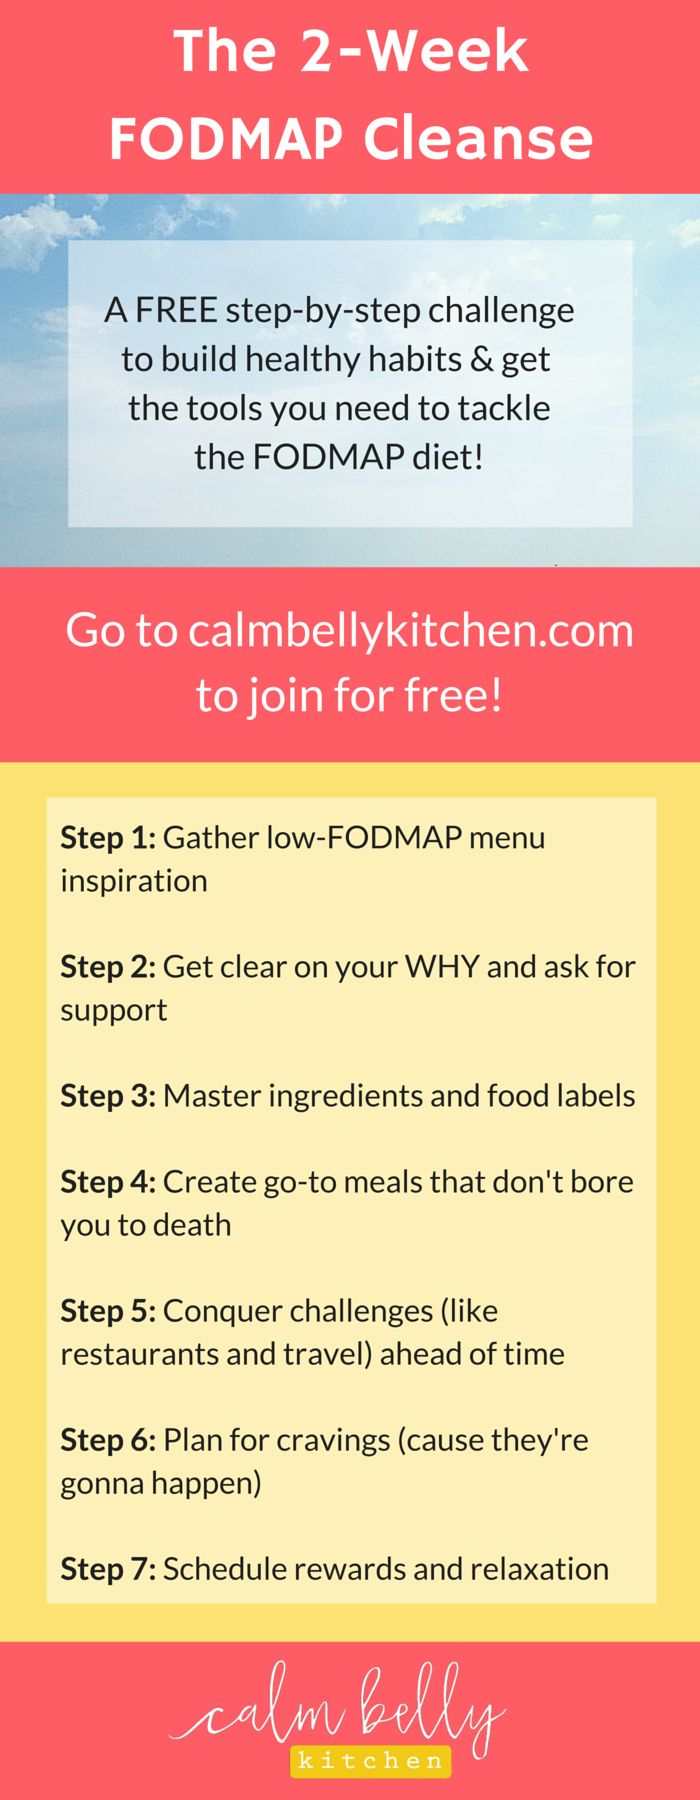 how to get rid of start menu borders